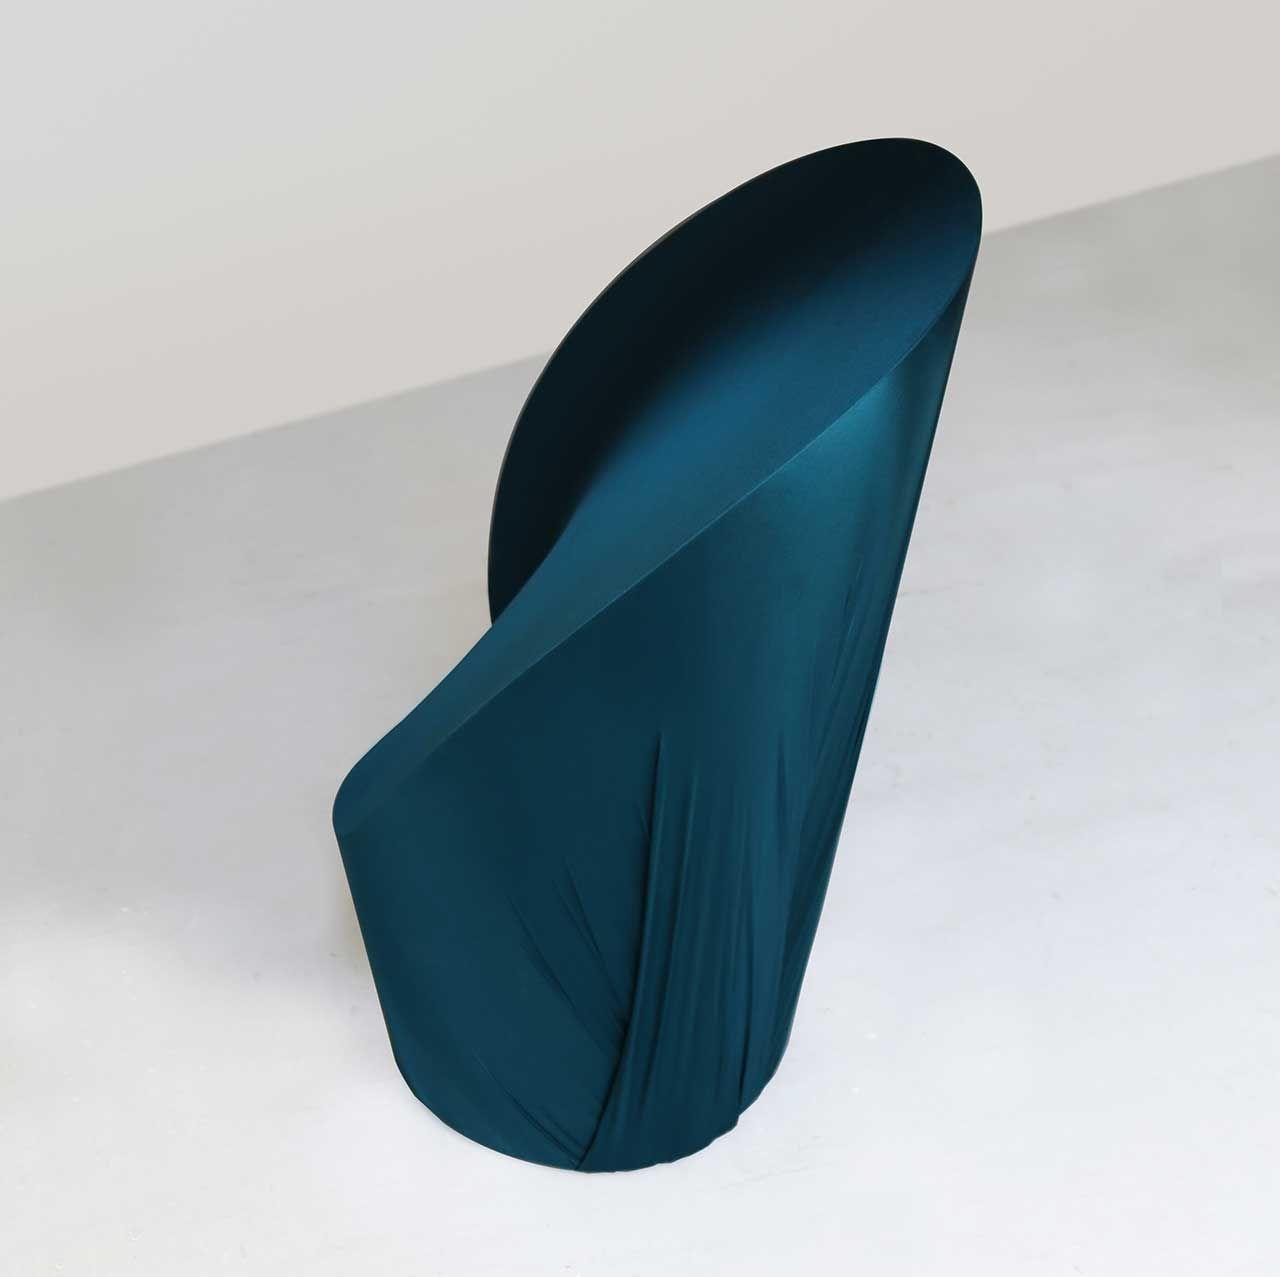 WantedDesign 2019 Launch Pad Furniture Winner: Seonhee Sunny Kim - Design Milk